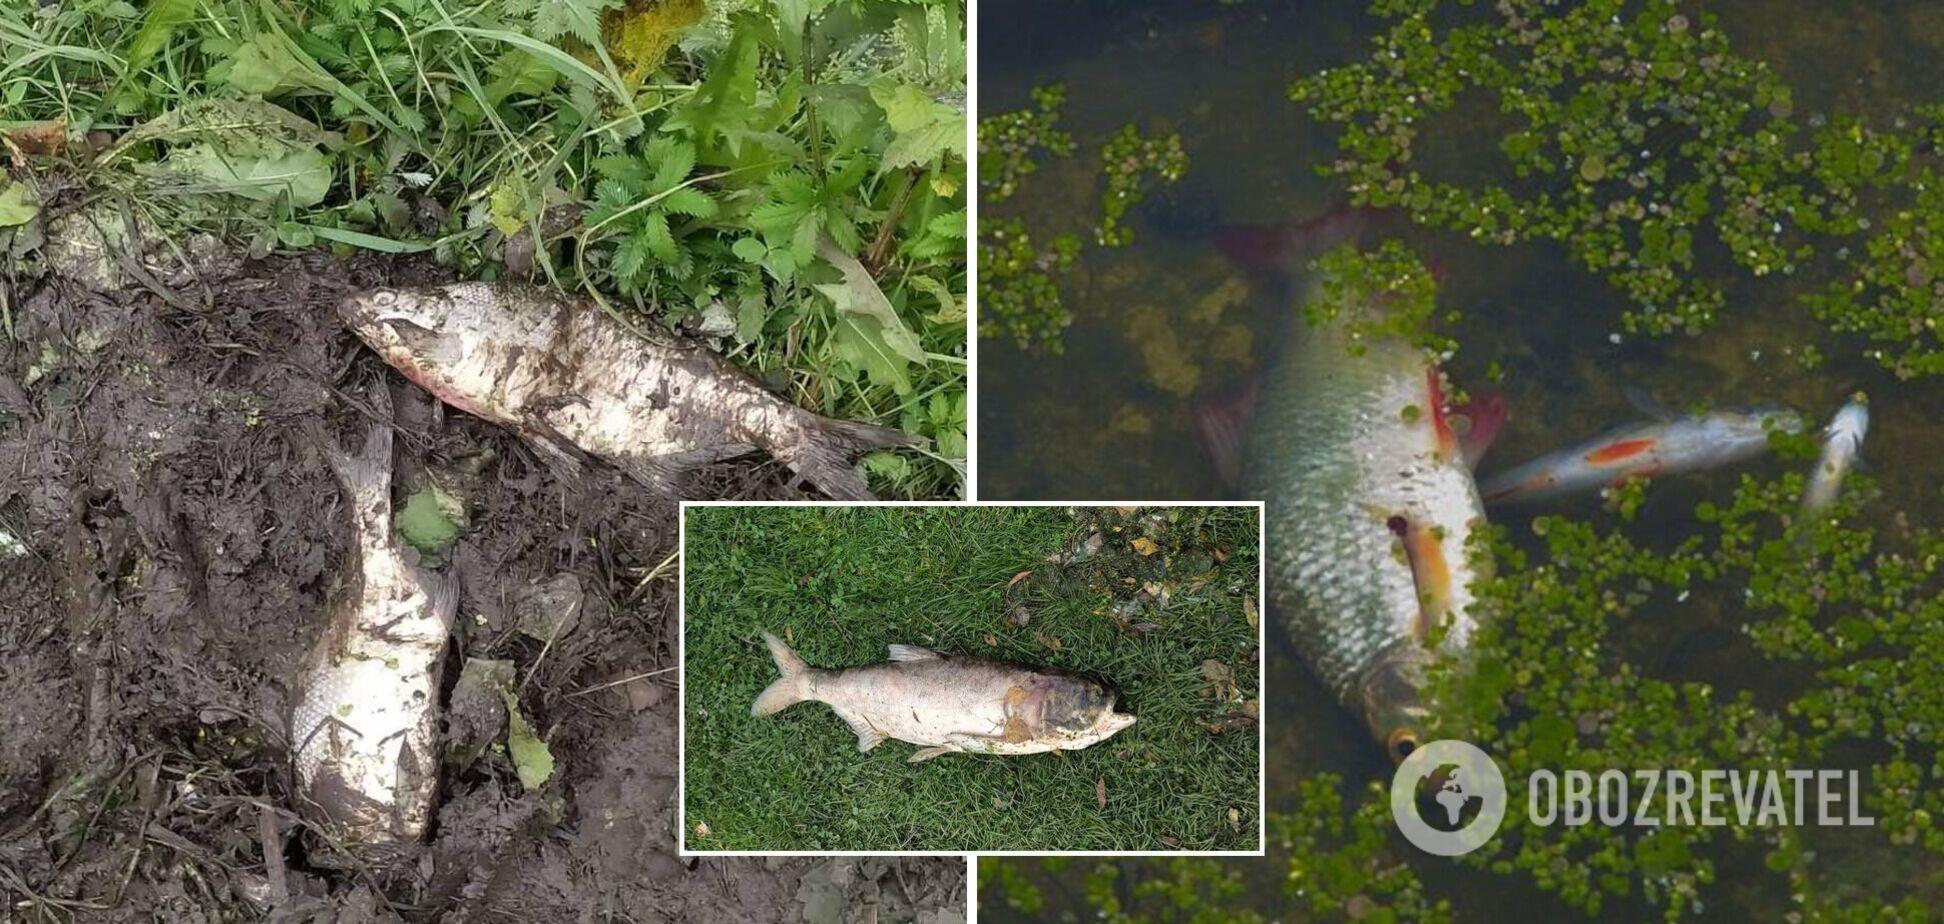 В реке на Хмельнитчине массово гибнет рыба: на воде заметили пятна масла и запах аммиака. Фото